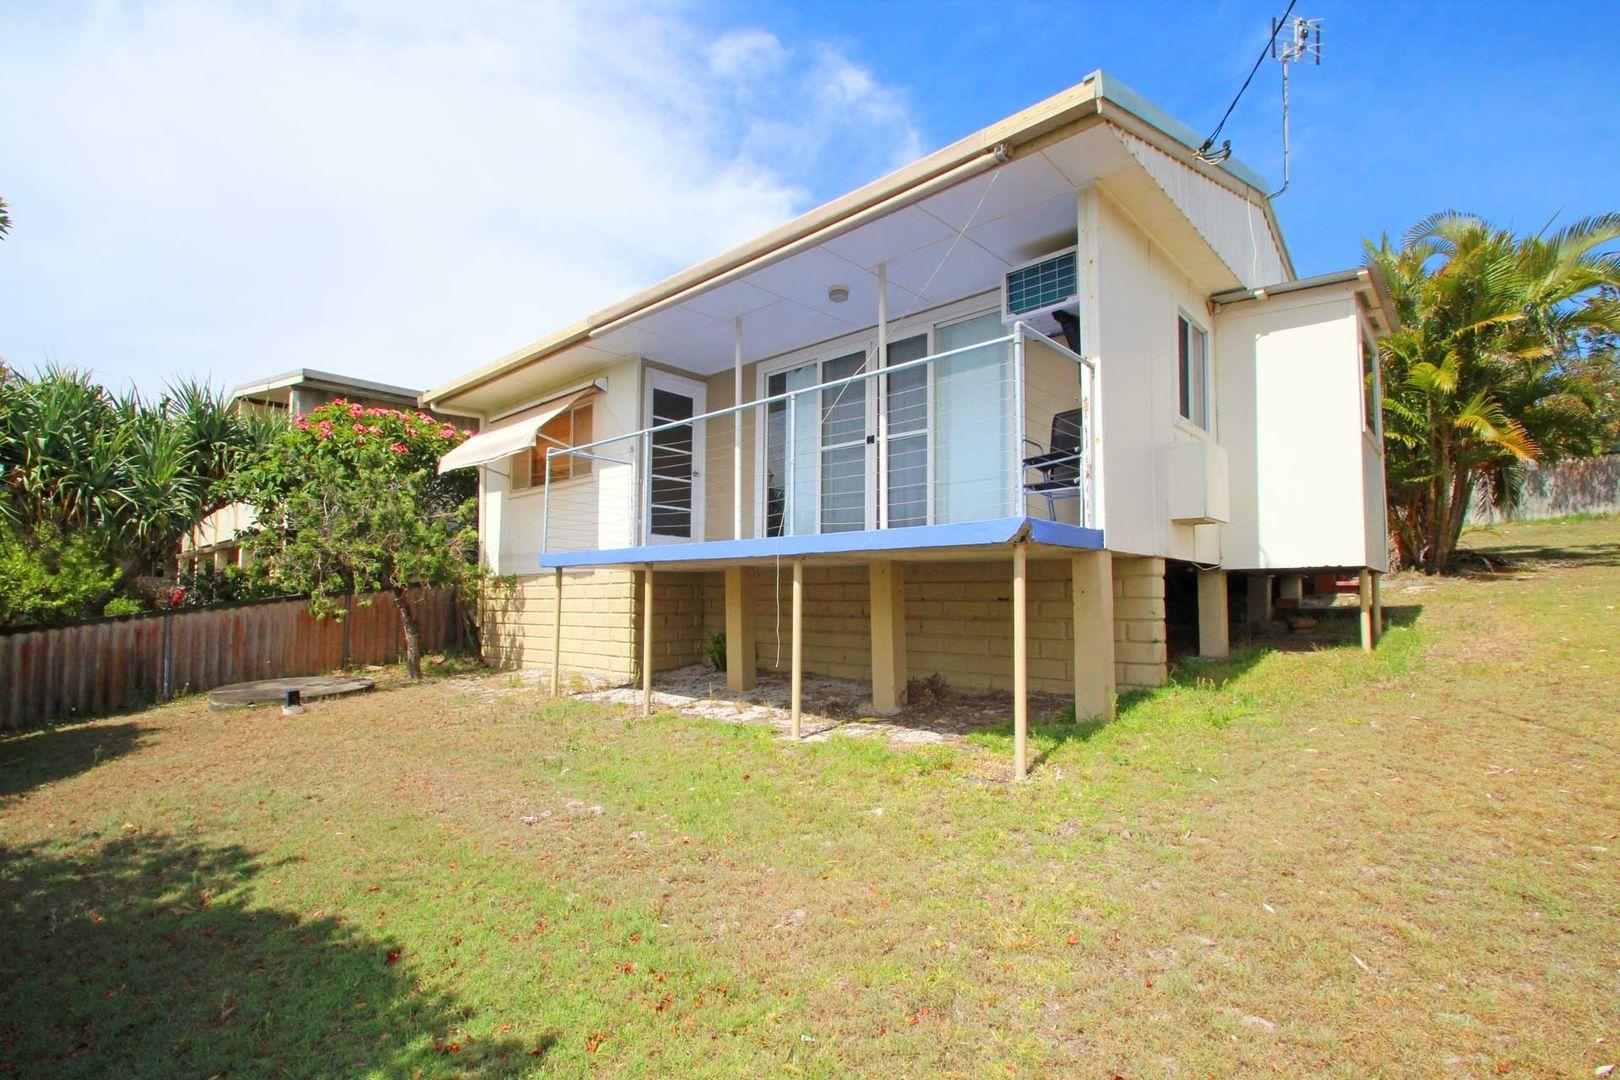 9 Hibiscus Avenue, Brooms Head NSW 2463, Image 0